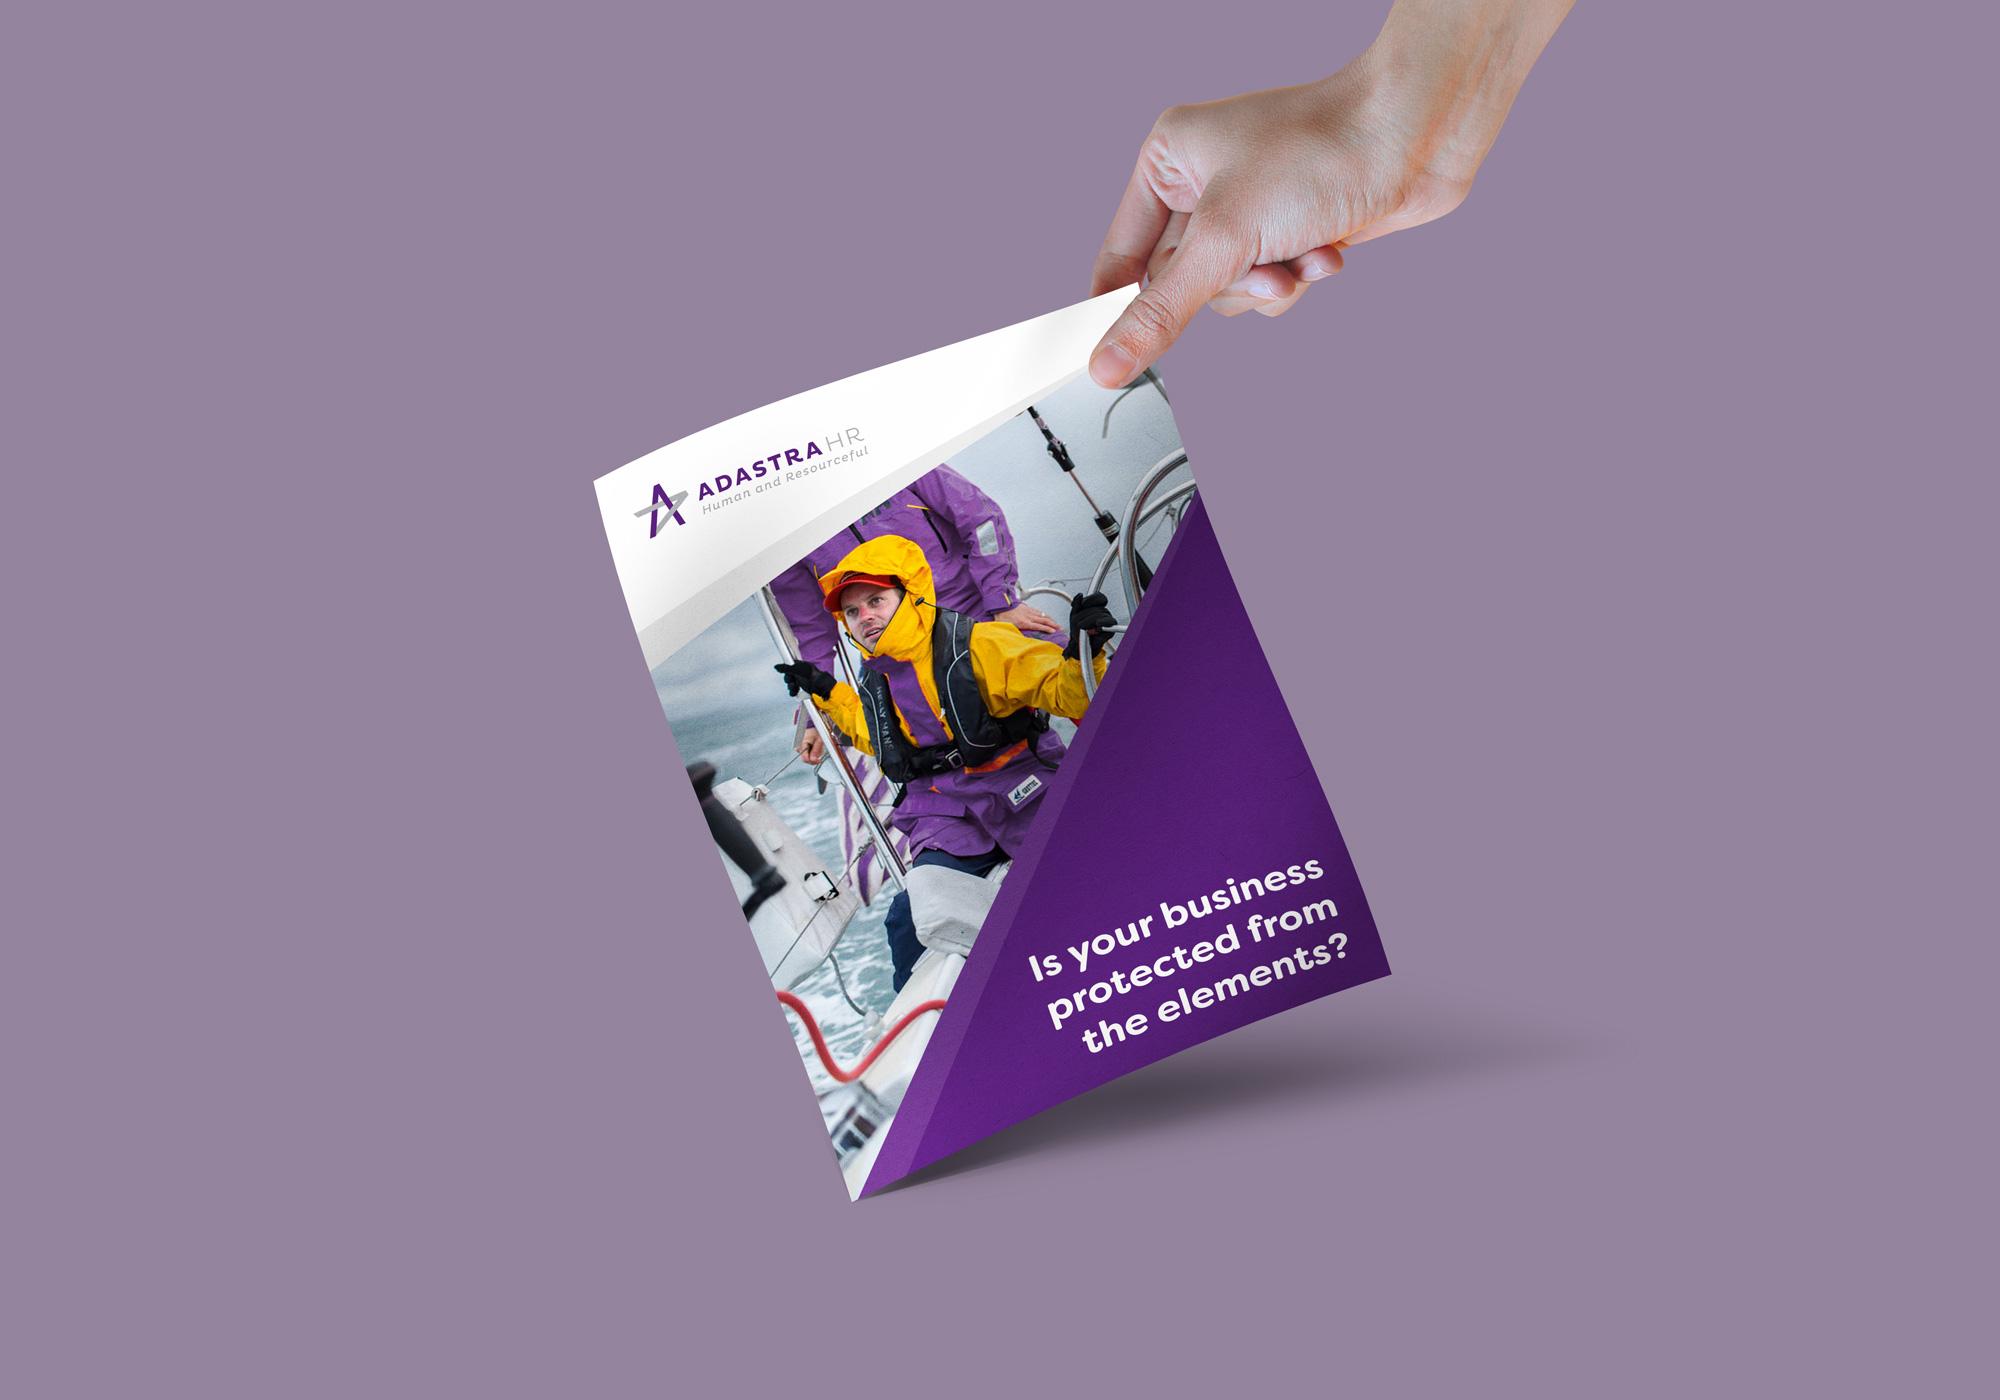 adastra hr | full digital service - Adastra Showcase 1 - Adastra HR | full digital service